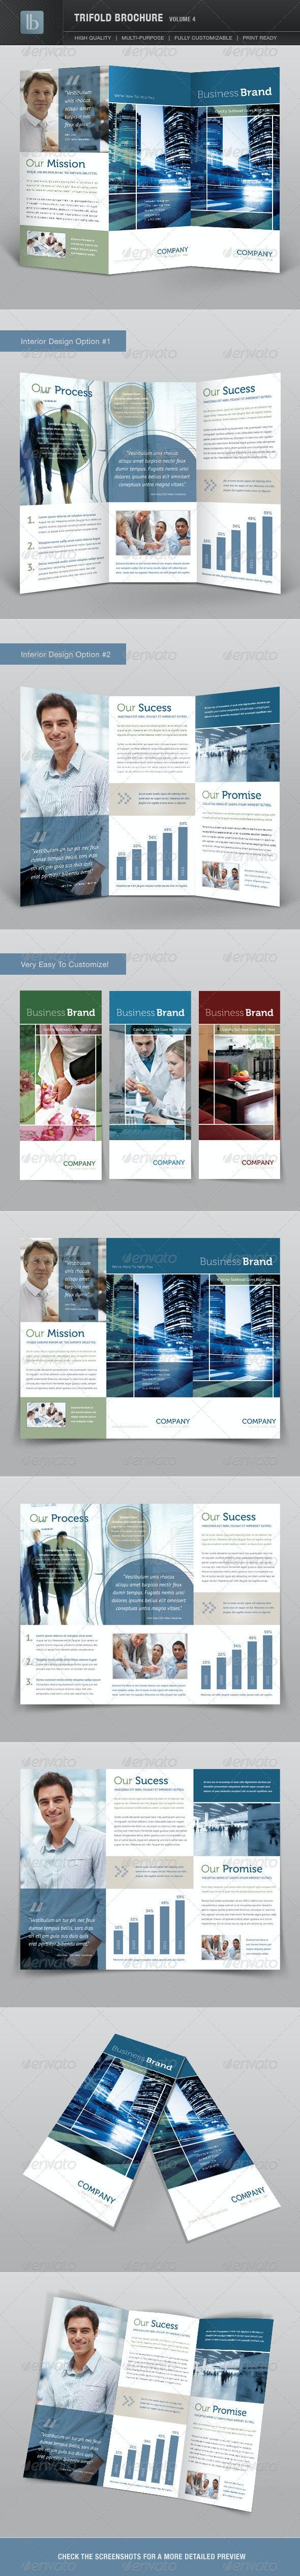 Trifold Brochure   Volume 4 - Corporate Brochures